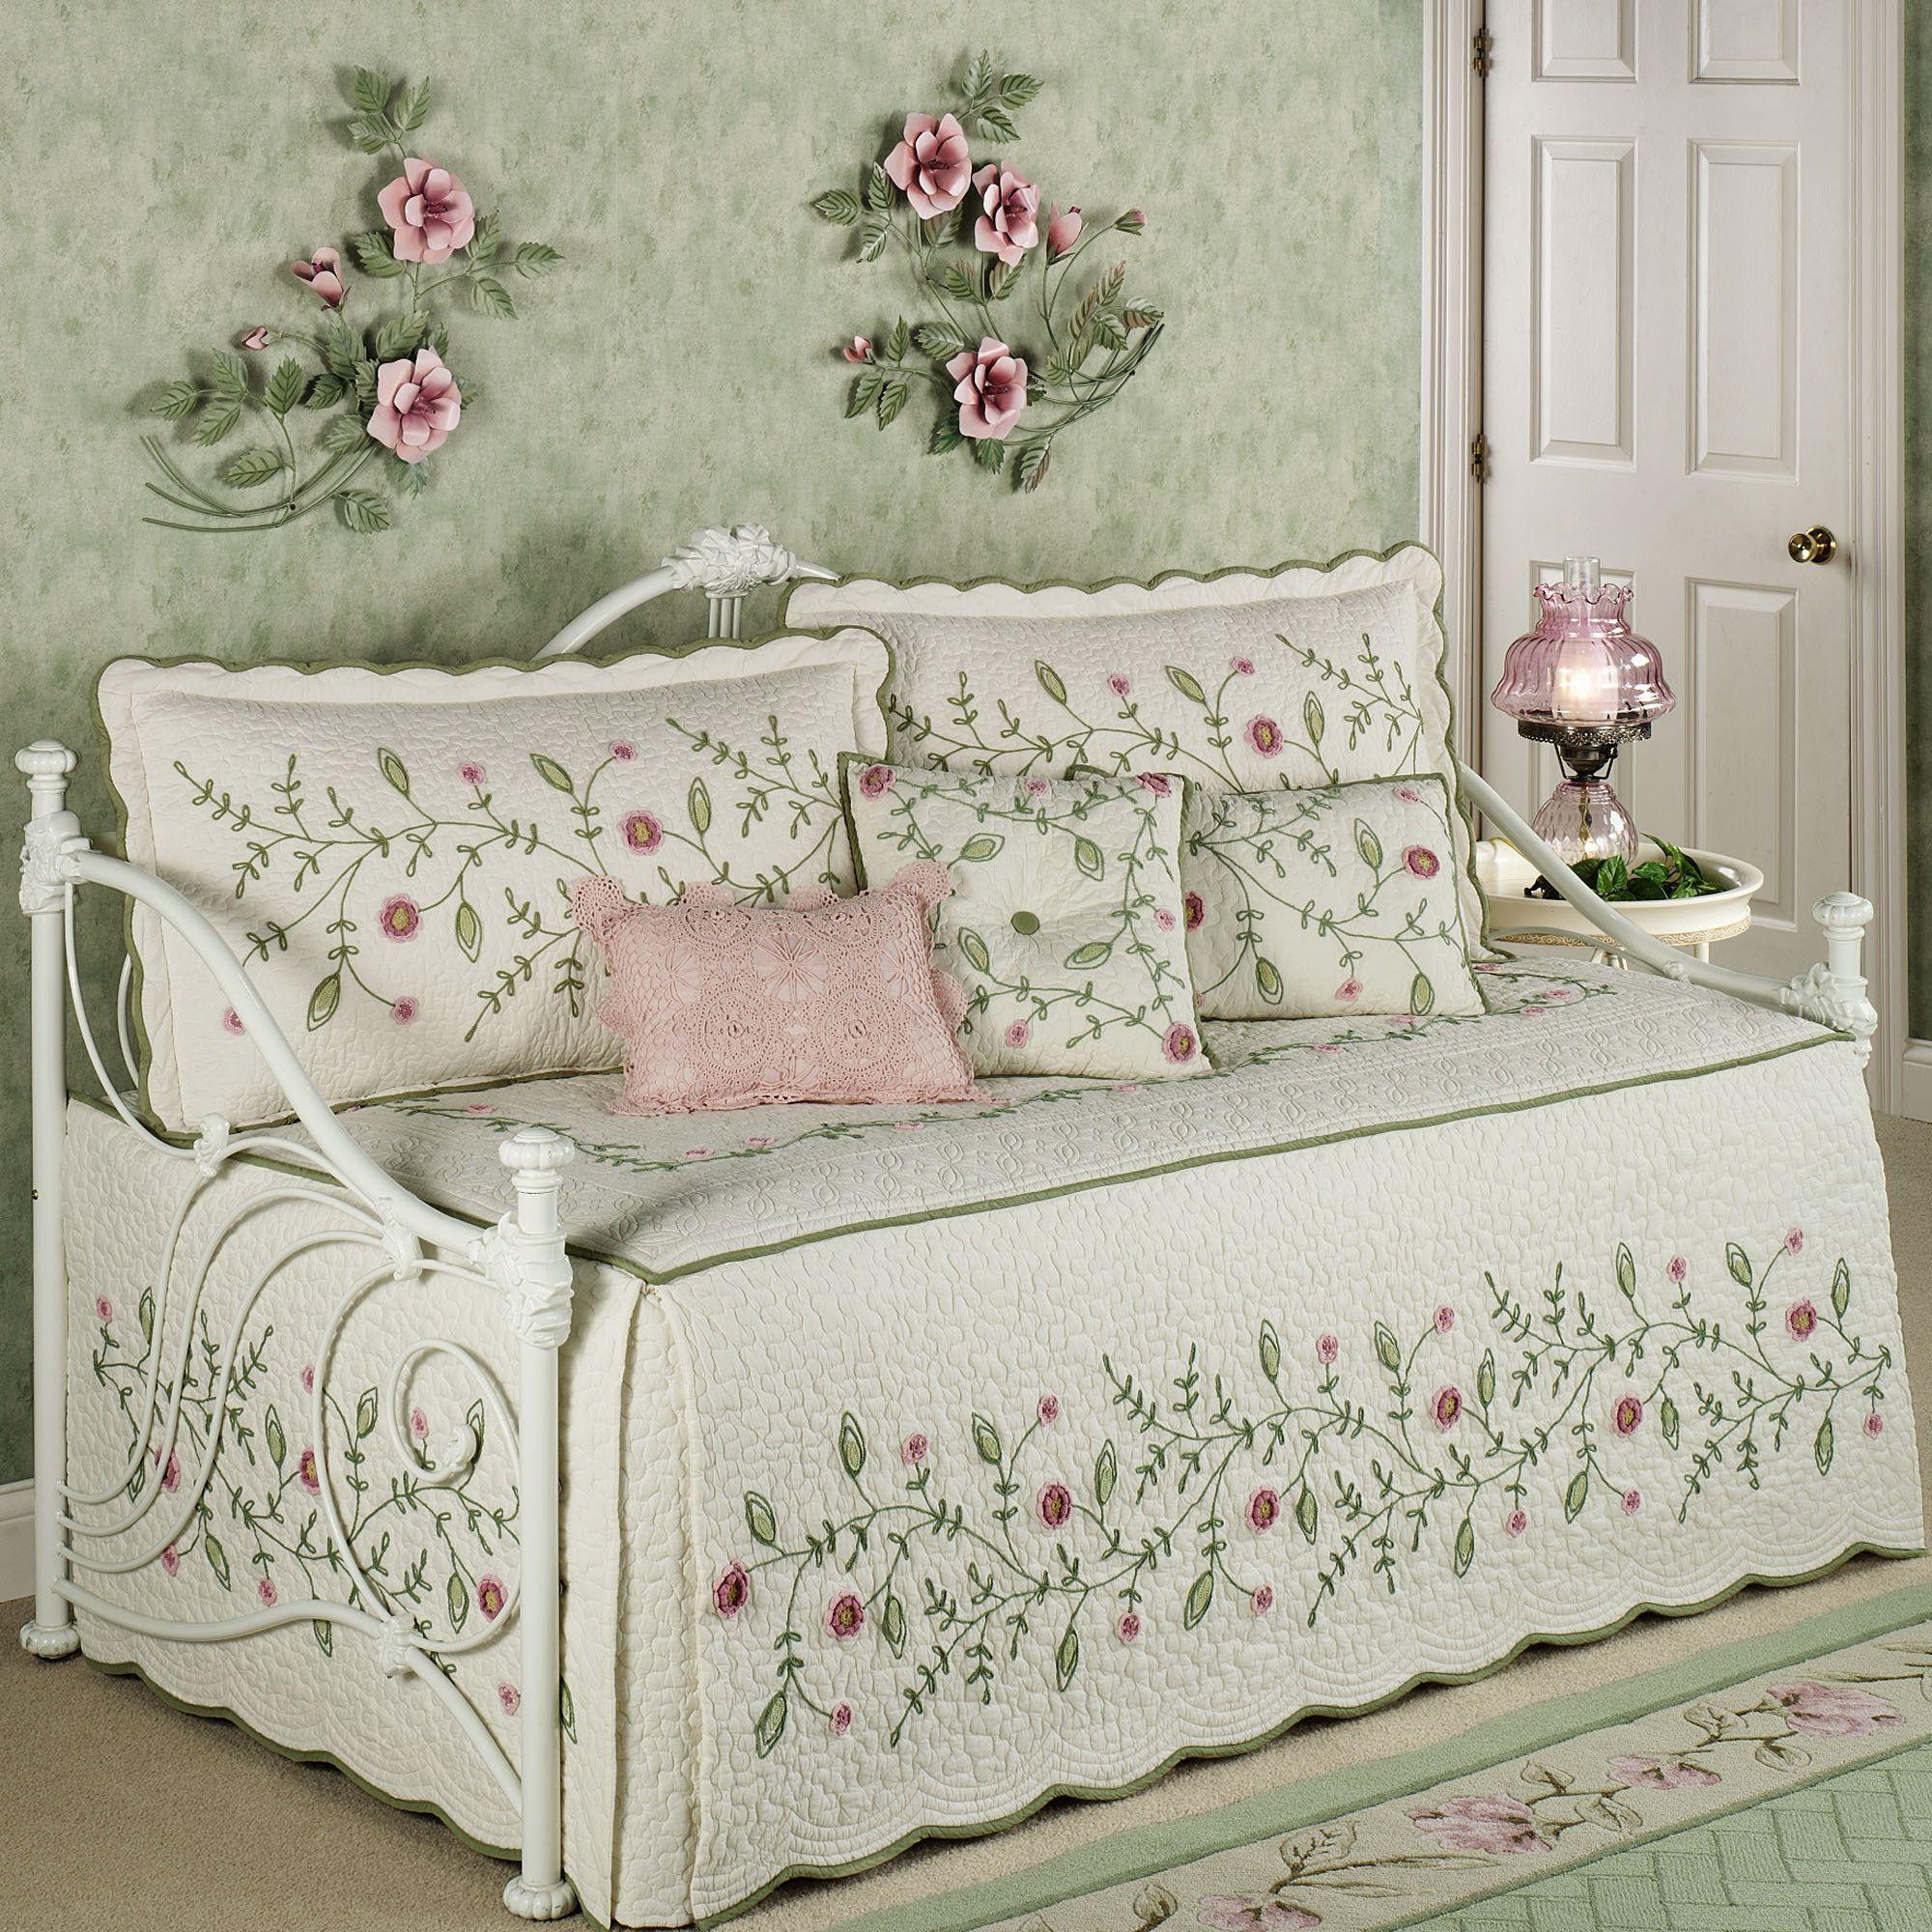 Amazing Posy Daybed Bedding Set